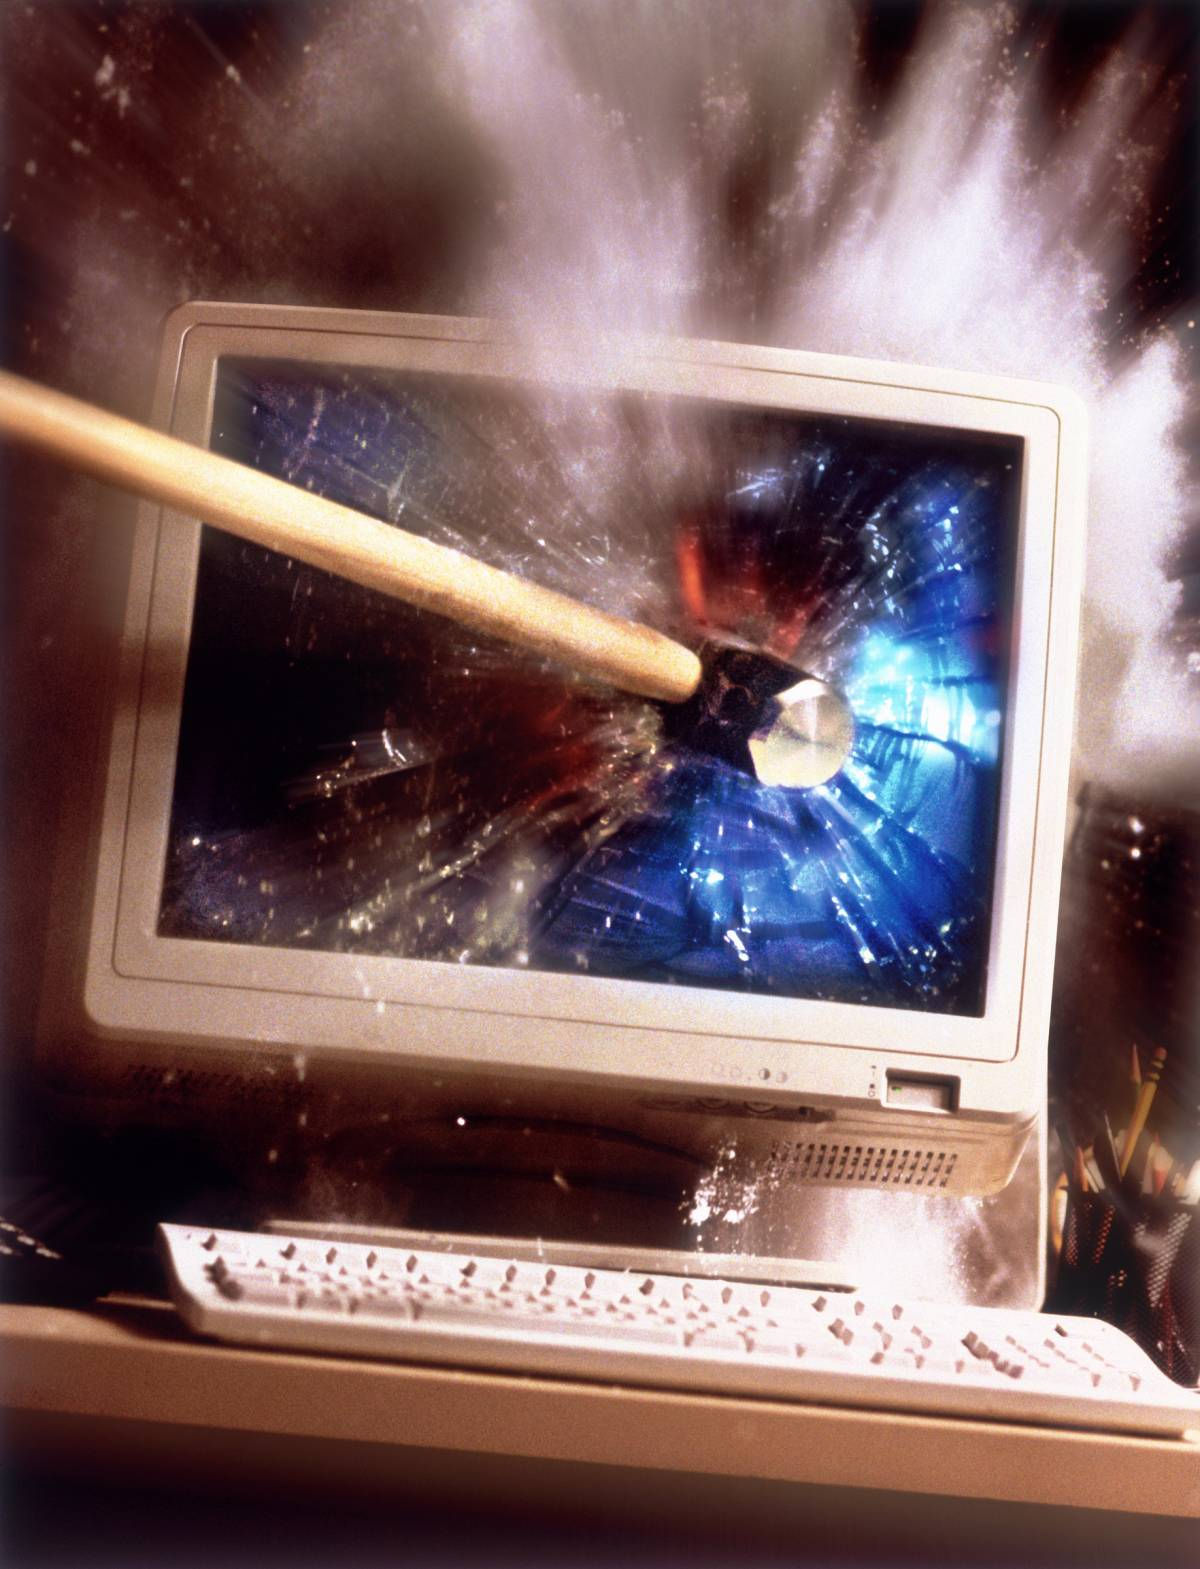 Ecco le ultime eco-vittime   La tv al plasma e Google...